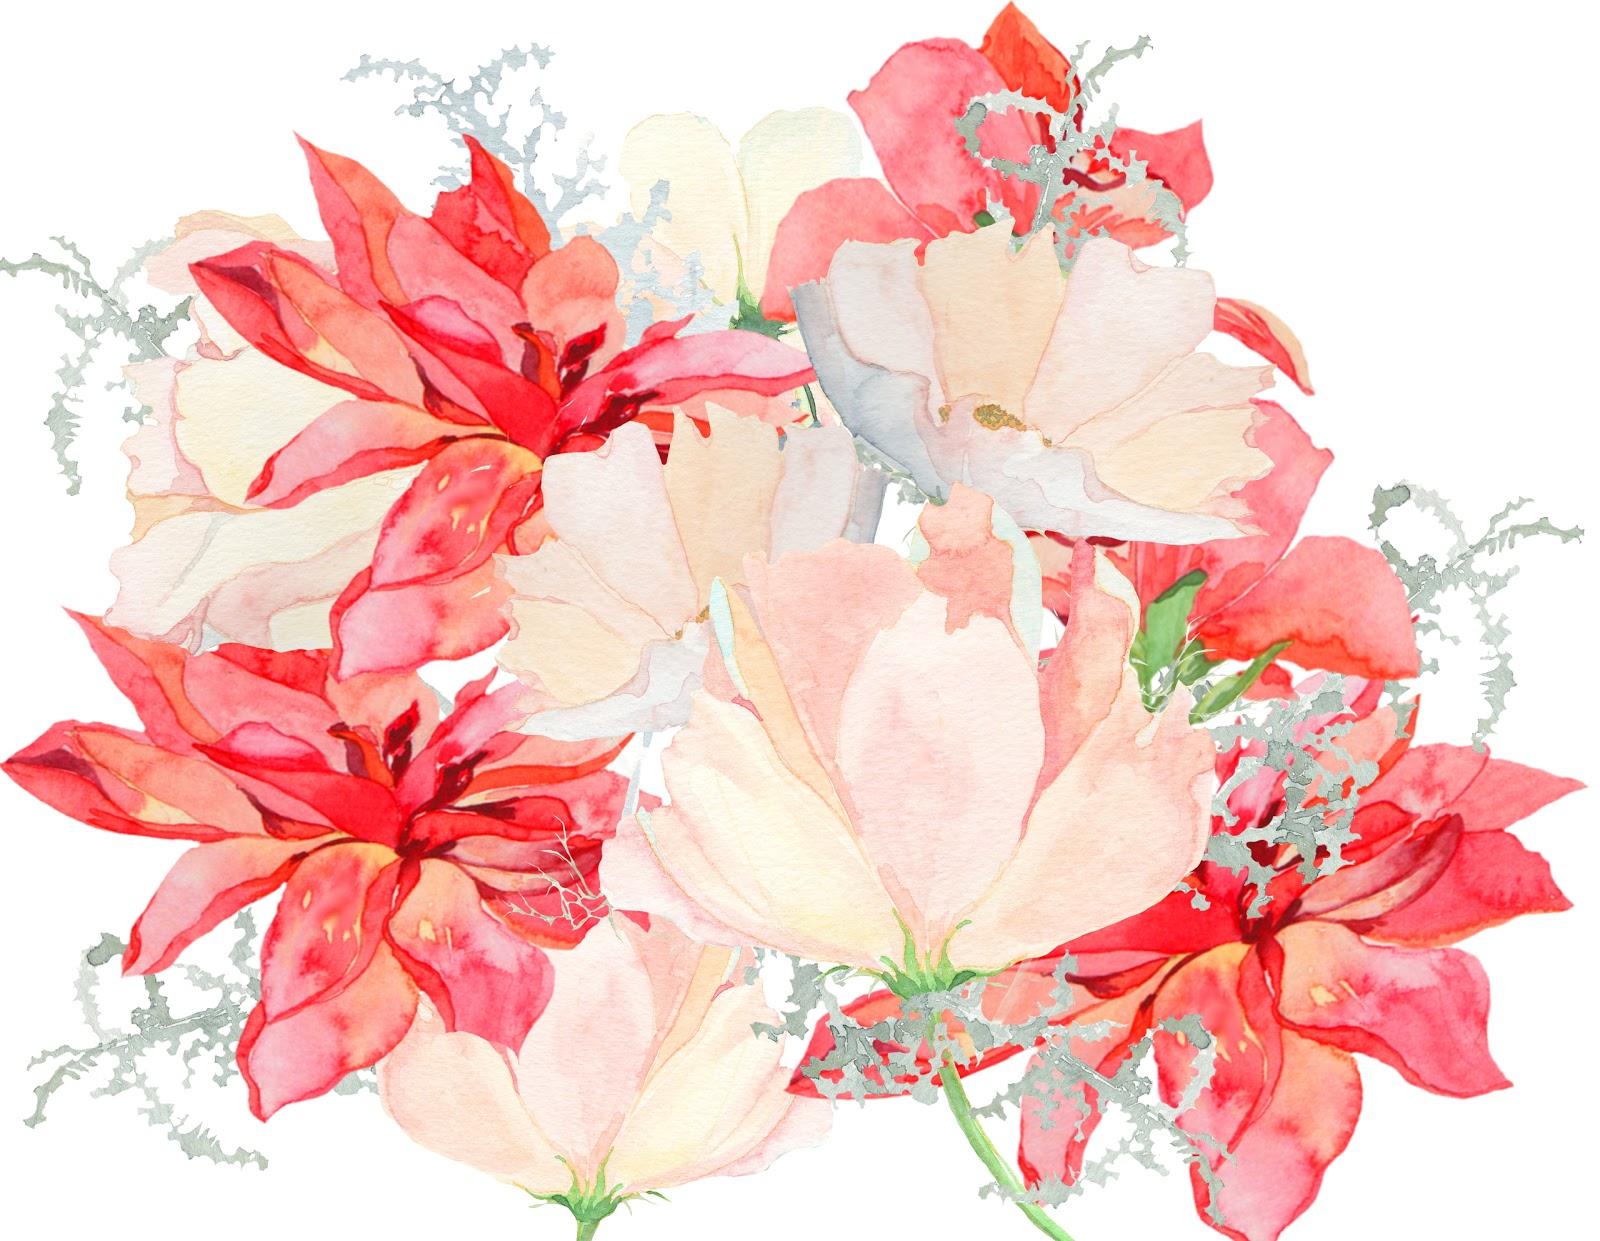 Tumblr Watercolor Flowers